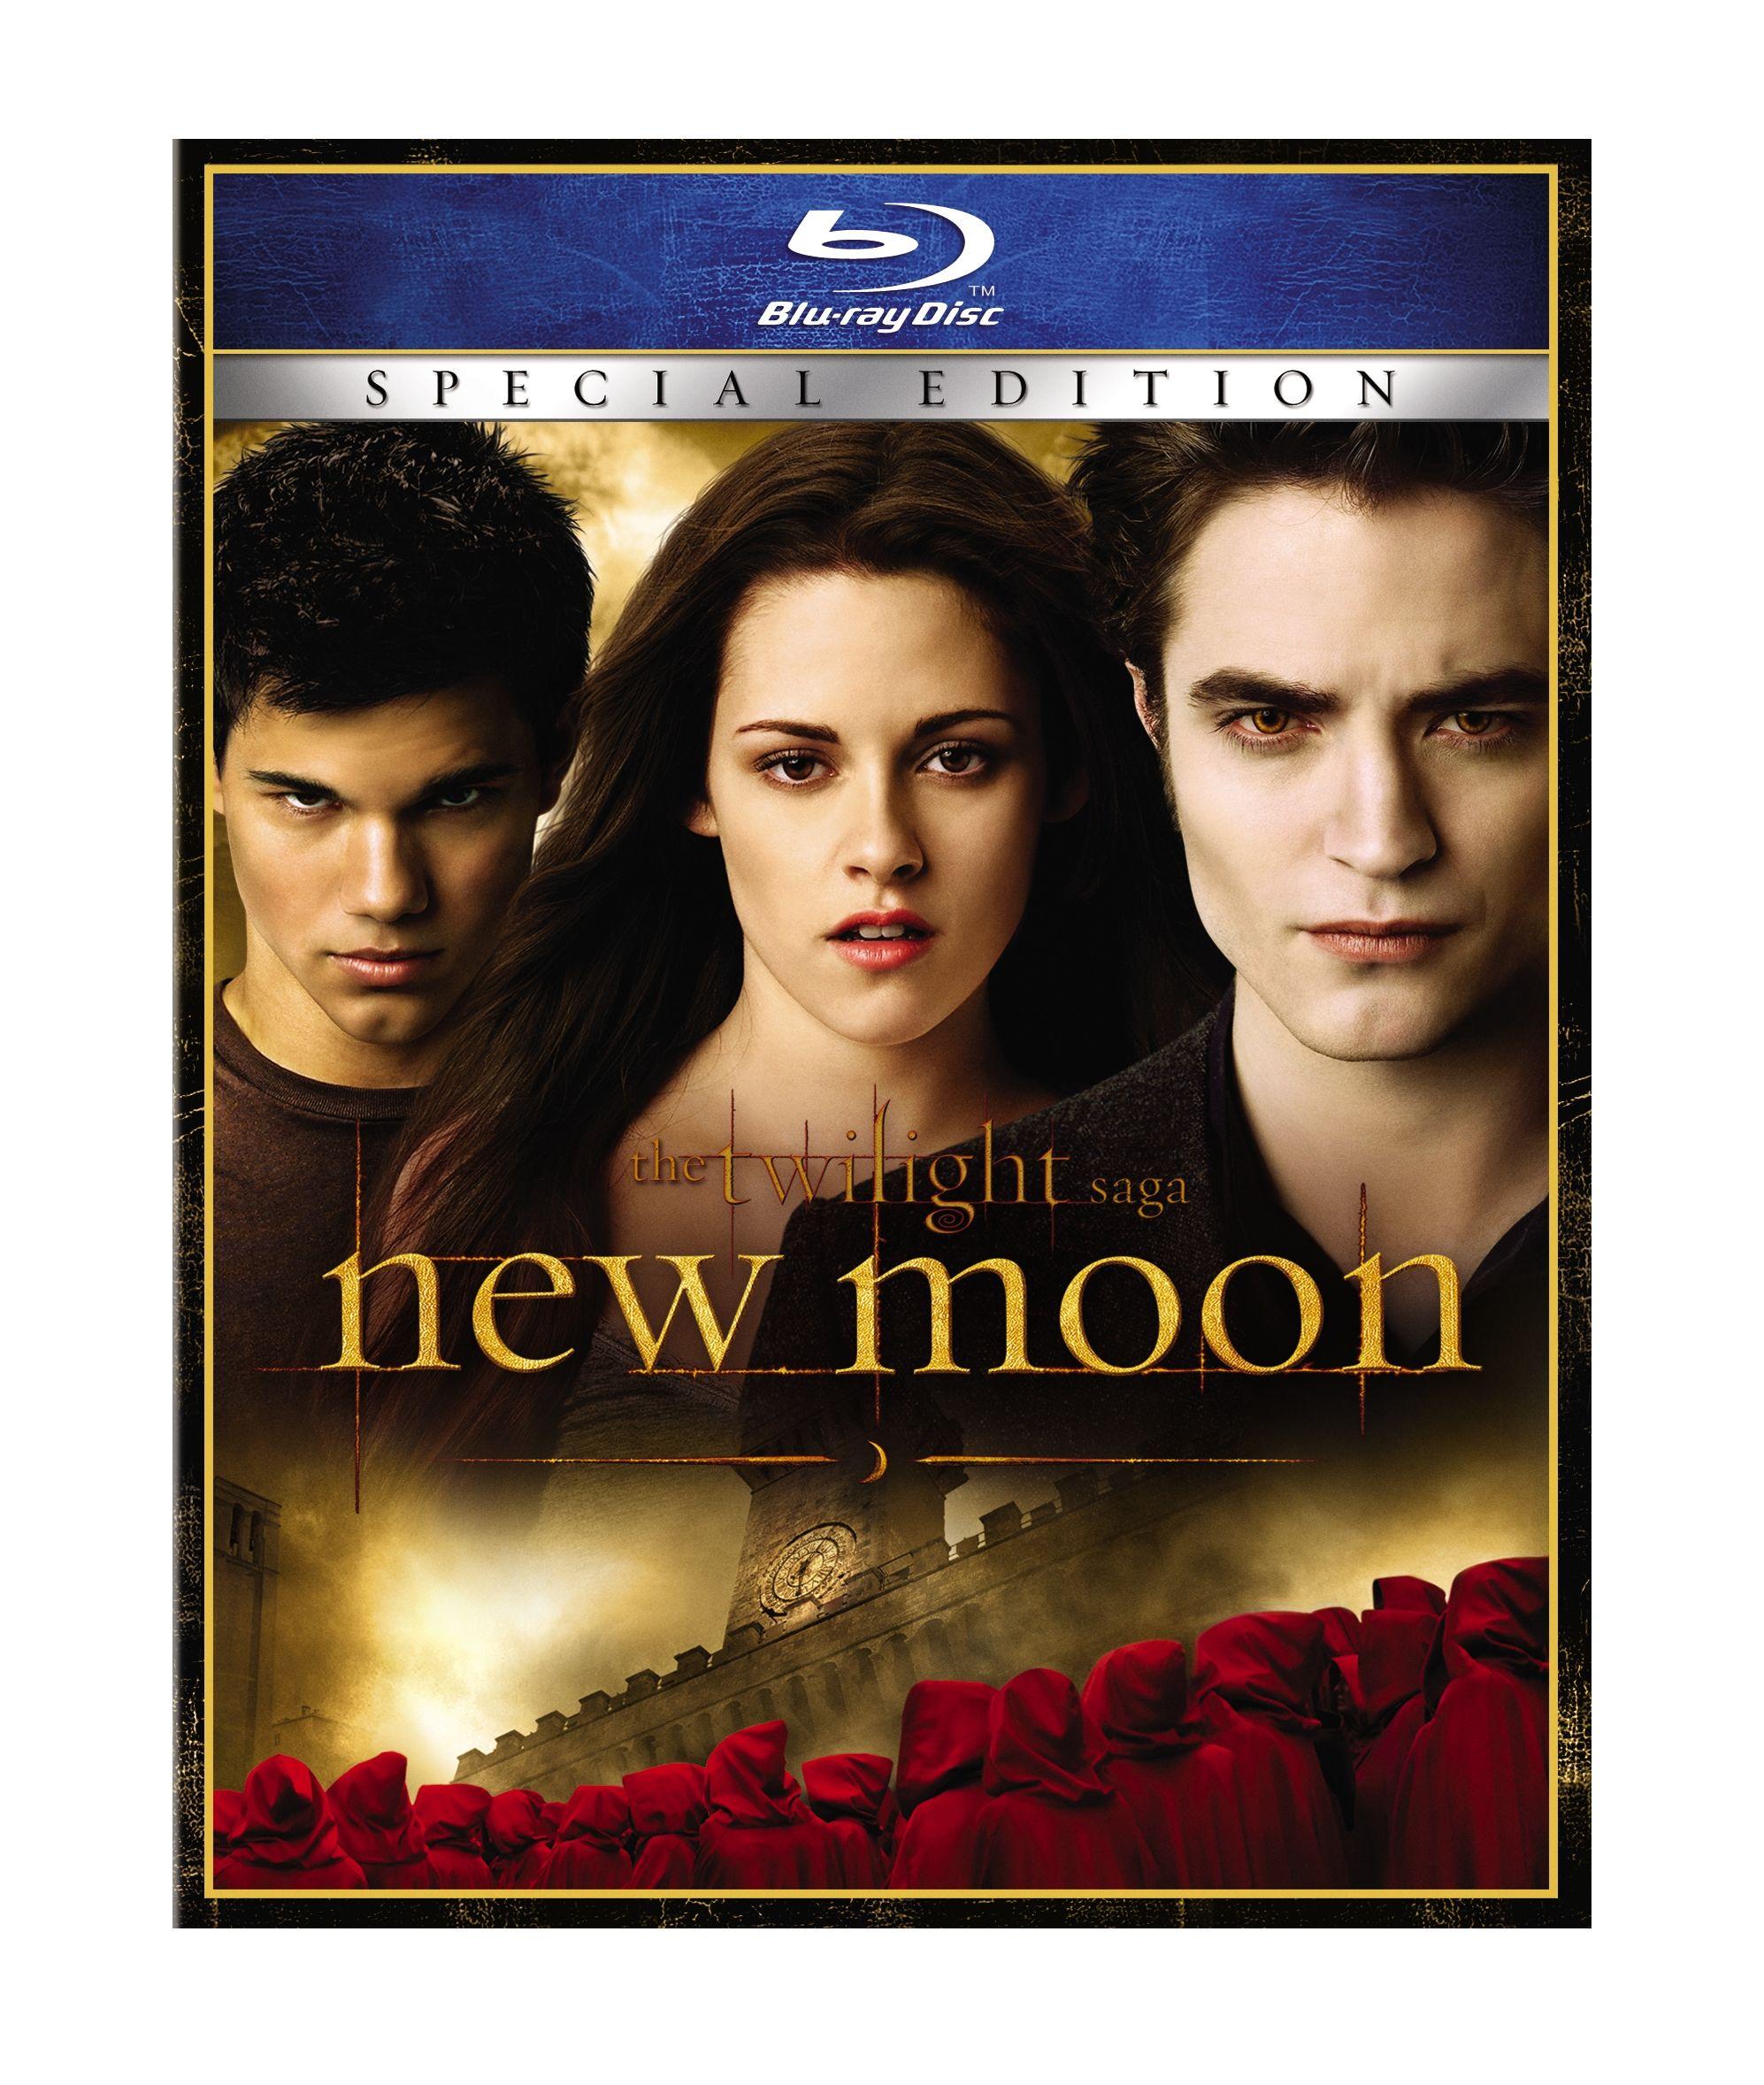 moon 2009 movie download